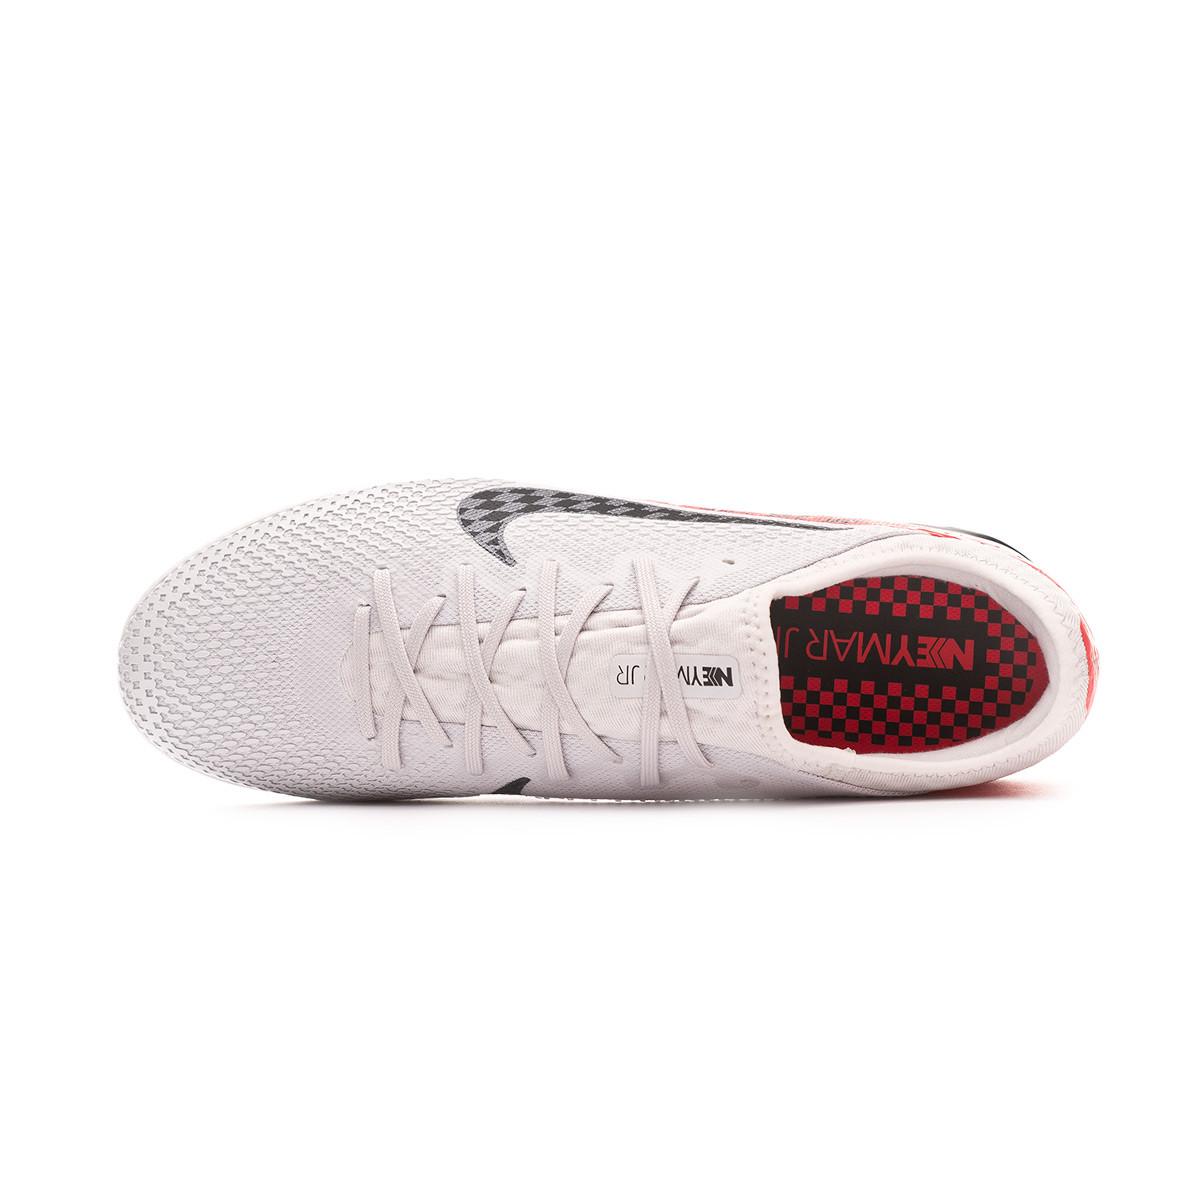 capitán miembro Igualmente  Futsal Boot Nike Mercurial Vapor XIII Pro IC Neymar Jr Platinum  tint-Black-Red orbit - Football store Fútbol Emotion